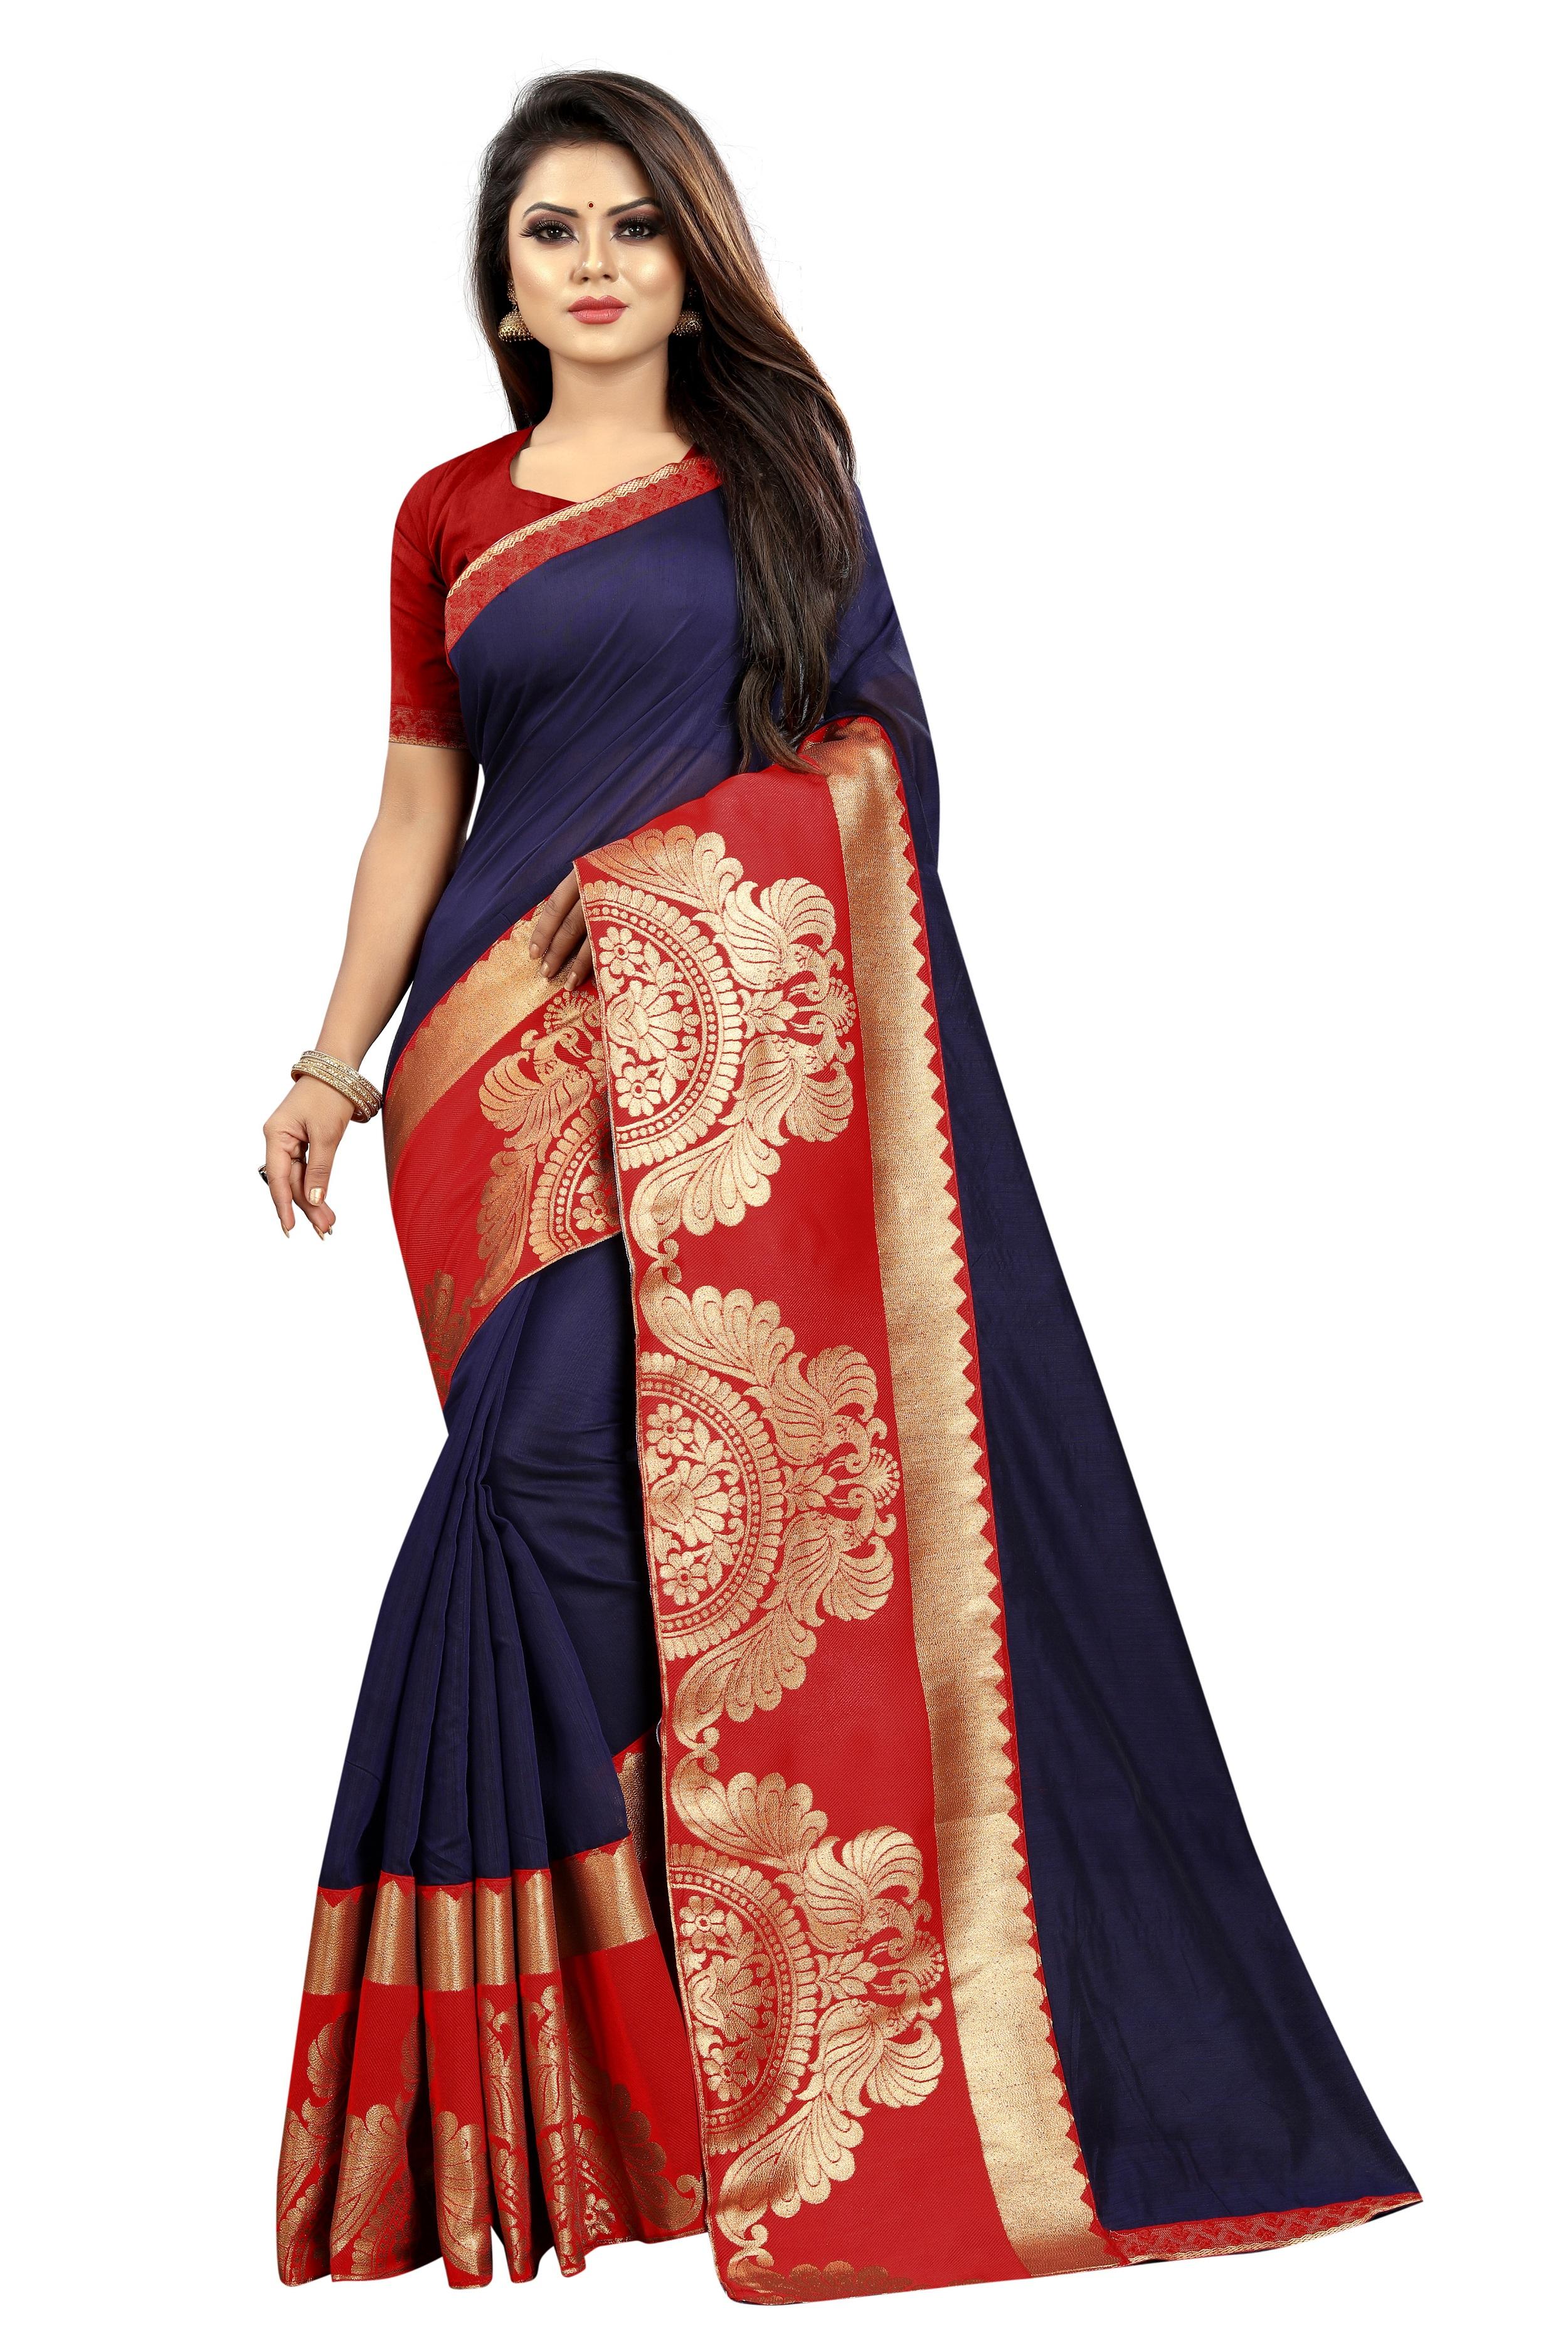 JINAL & JINAL | JJ Women's Chanderi Cotton Saree - TT NAVY